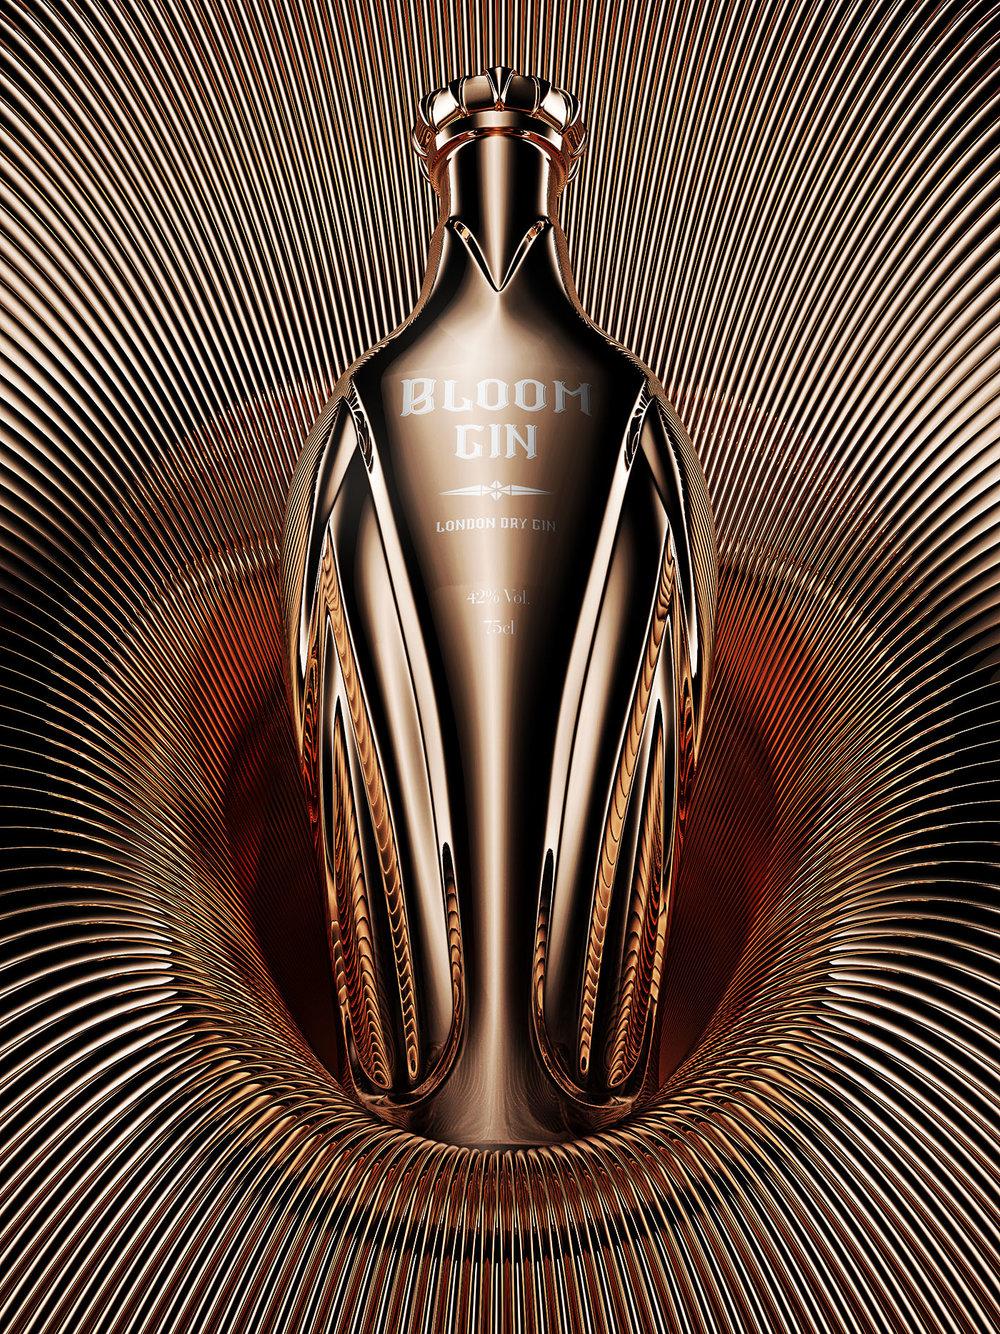 Bloom Gin, premium gin concept